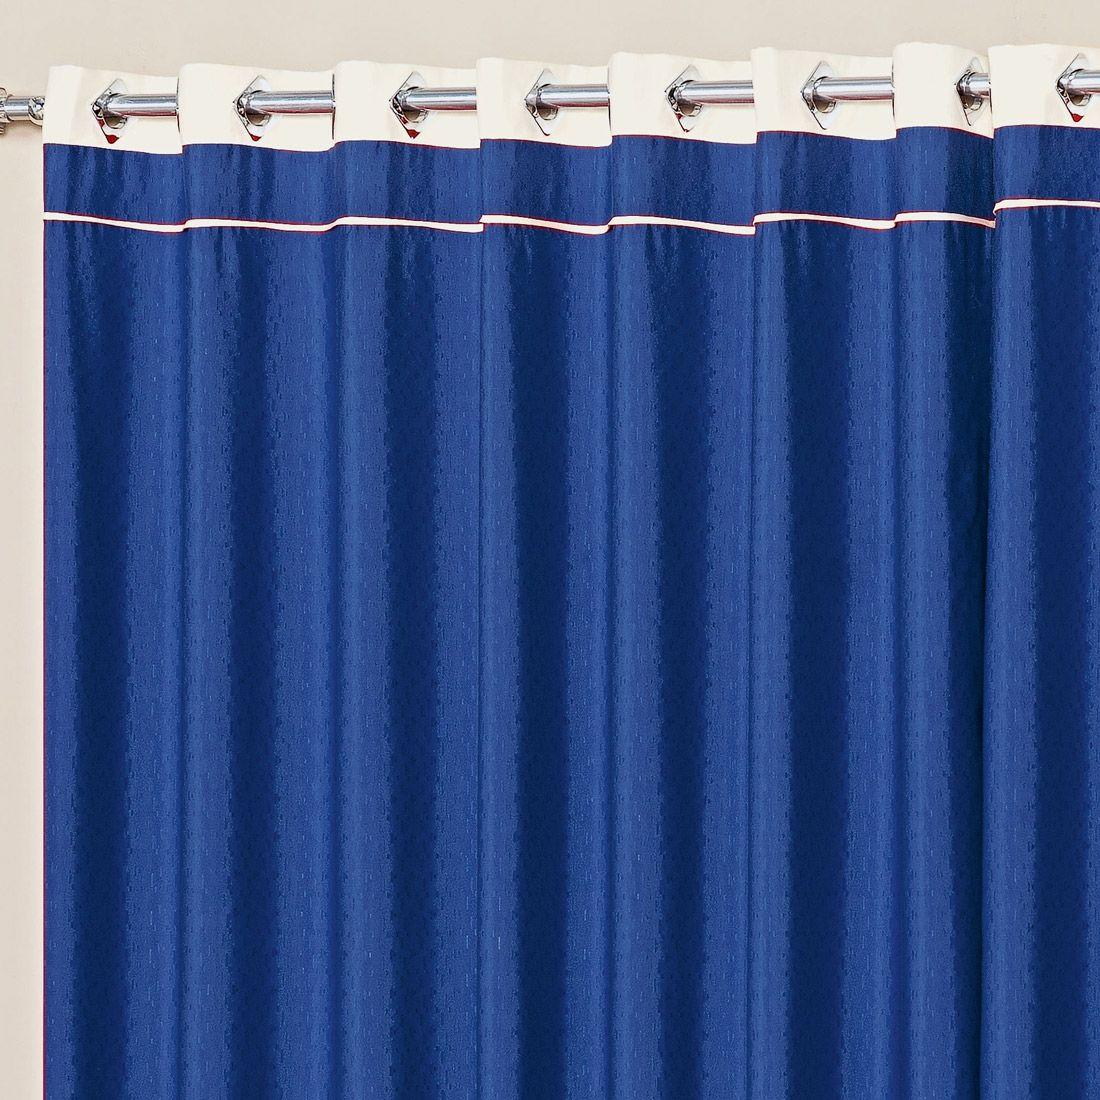 Cortina Marina Azul 3,00m x 2,50m p/ Varão Simples